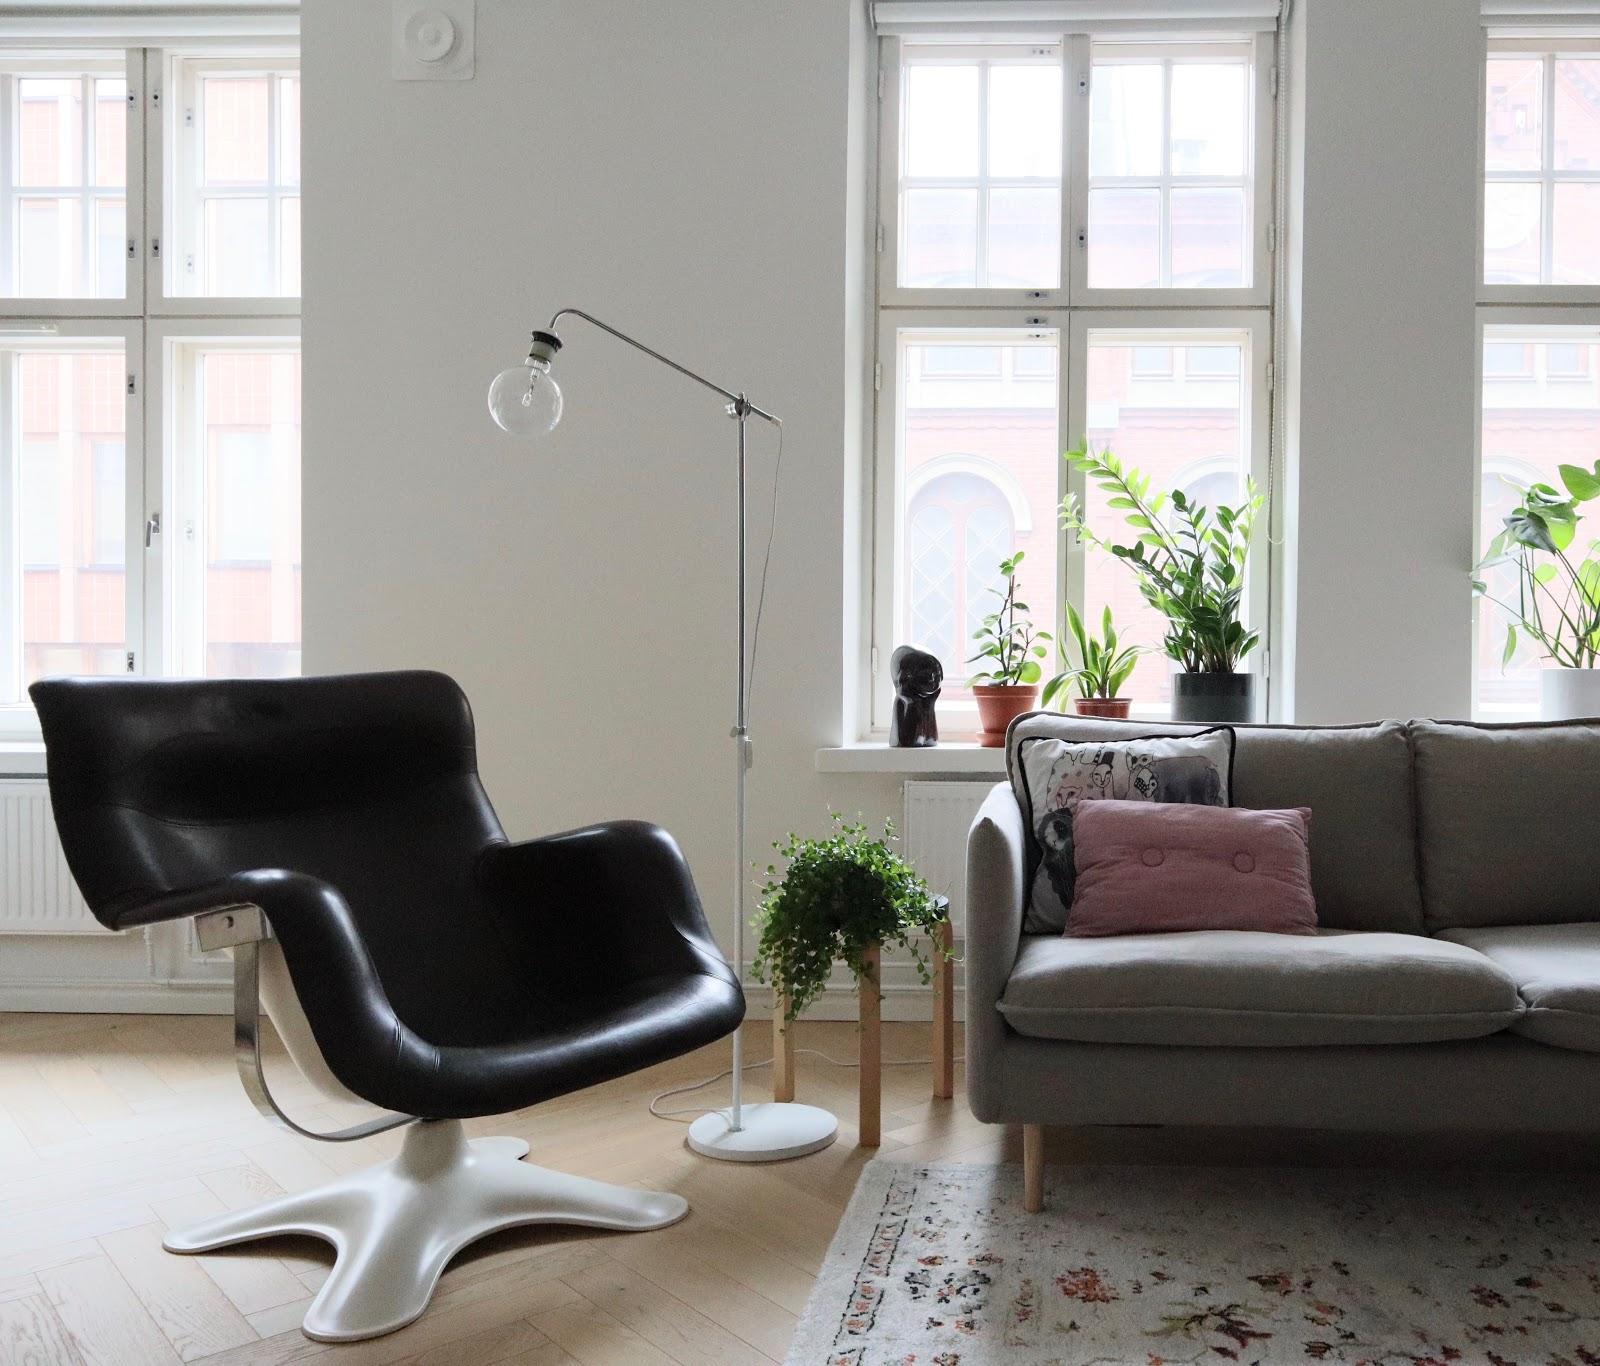 olohuoneen sisustus midmod skandinavian design kukkapuro karuselli livingroom interior